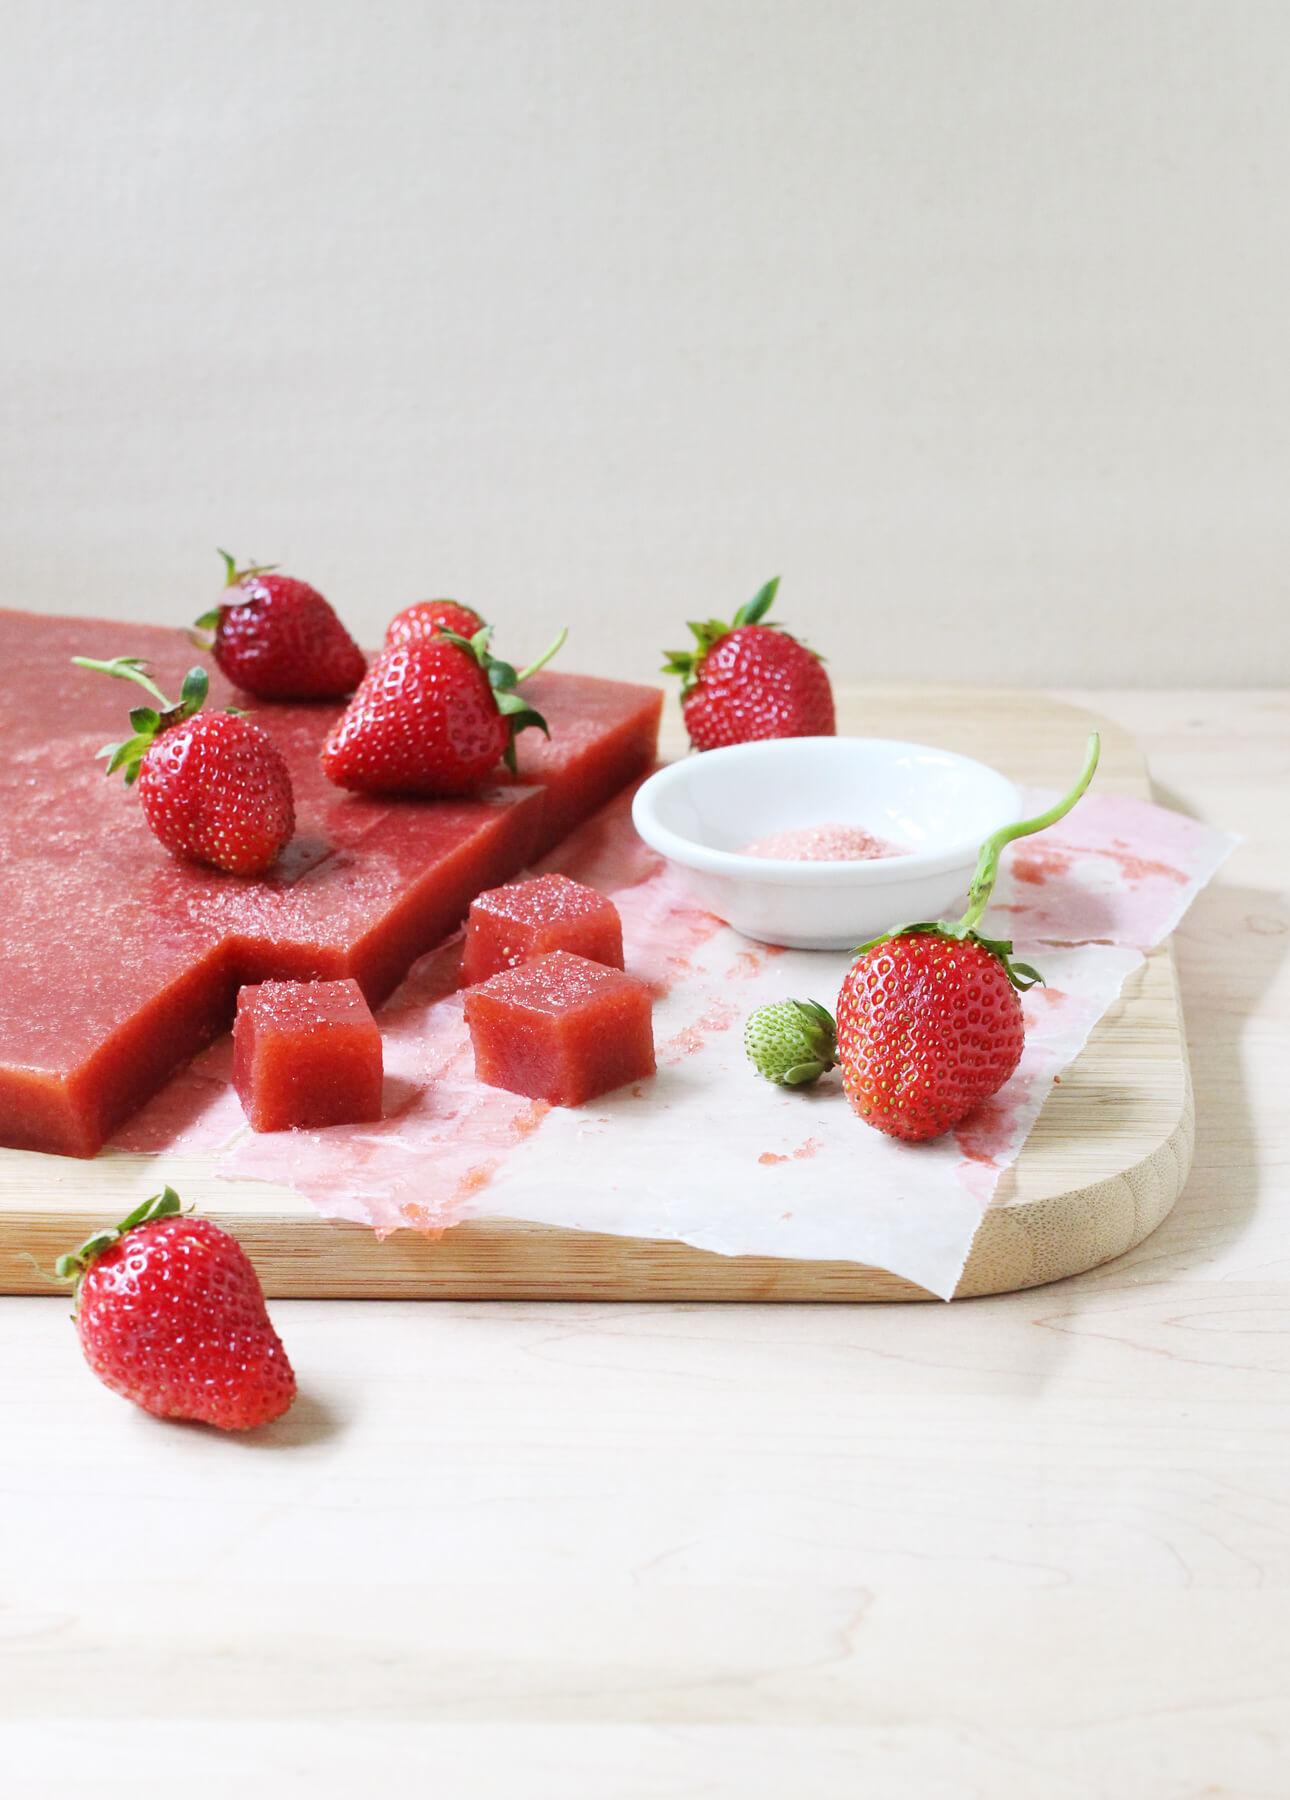 strawberry rhubarb pate de fruit strawberry rhubarb pate de fruit